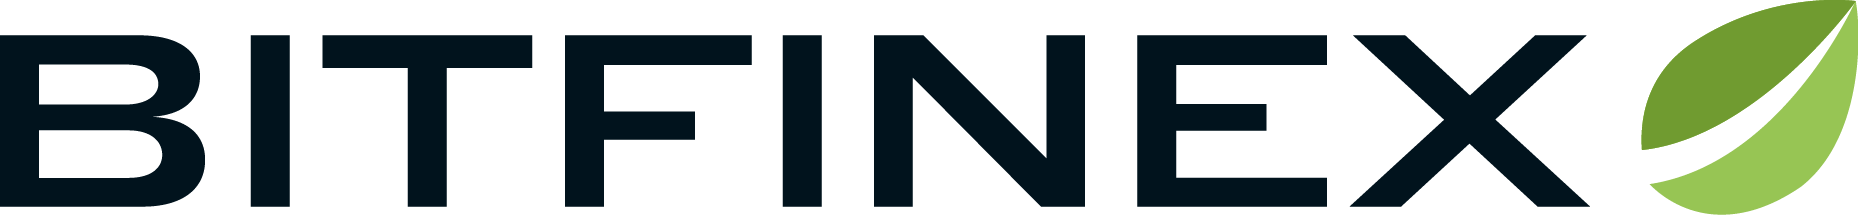 bitfinex logo vector